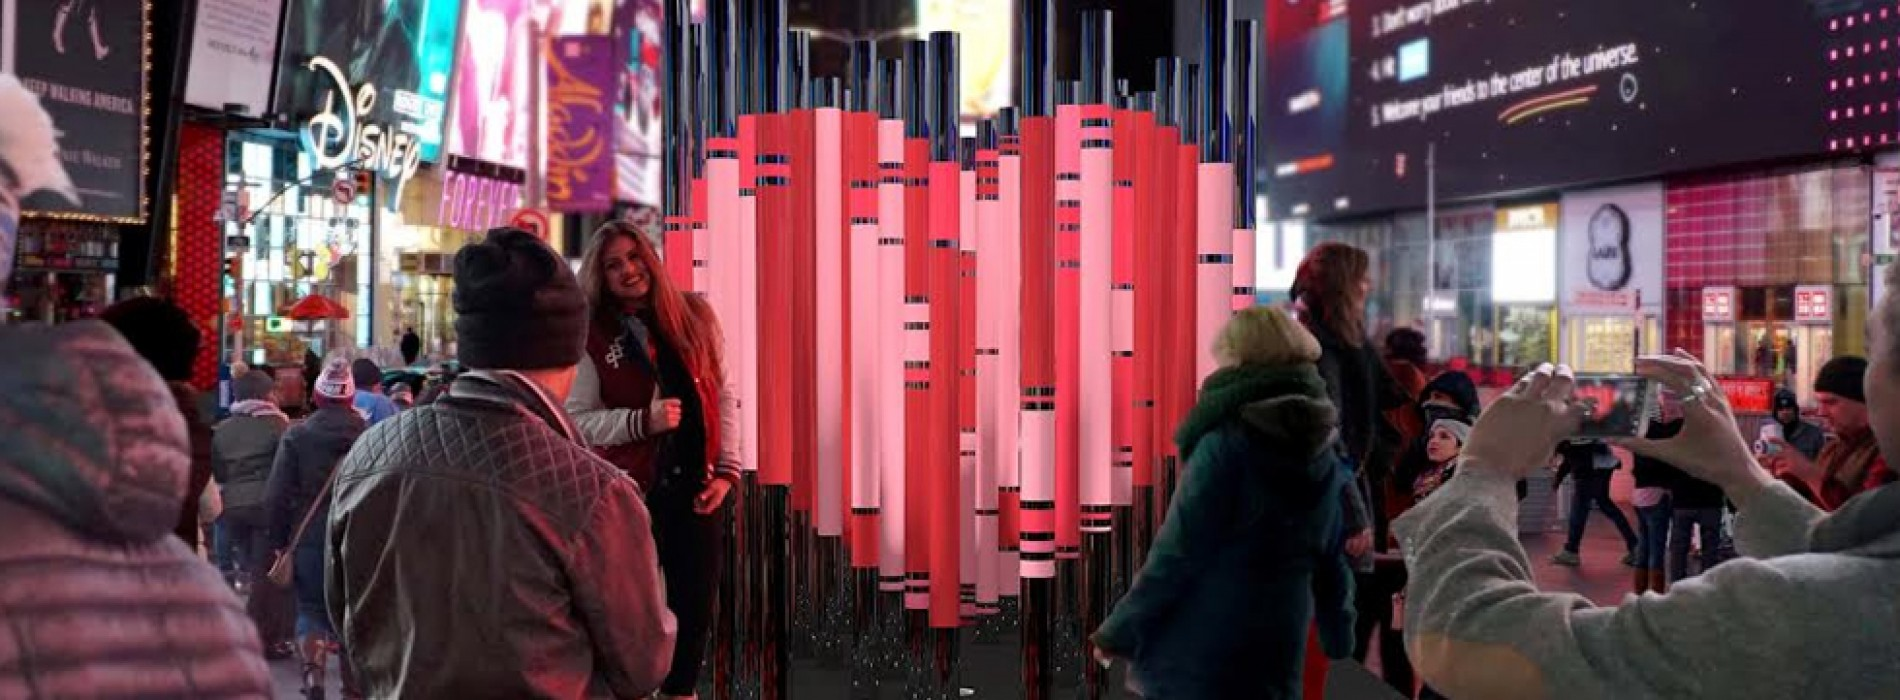 Celebrate Love this Valentine's Day in Romantic New York City